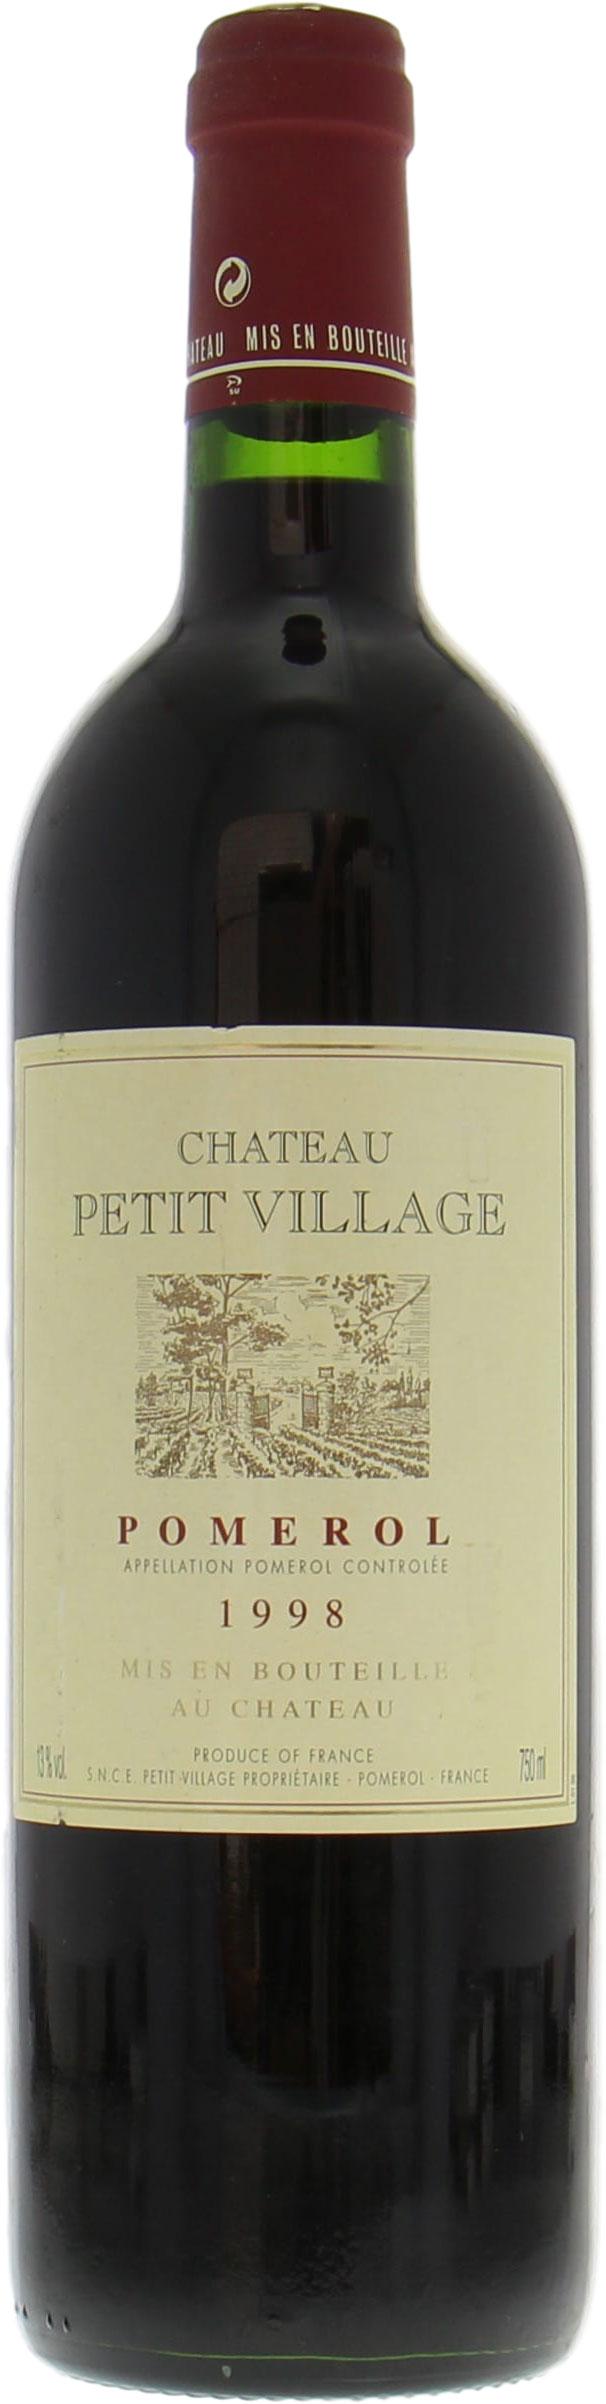 best of wines chateau petit village 1998. Black Bedroom Furniture Sets. Home Design Ideas